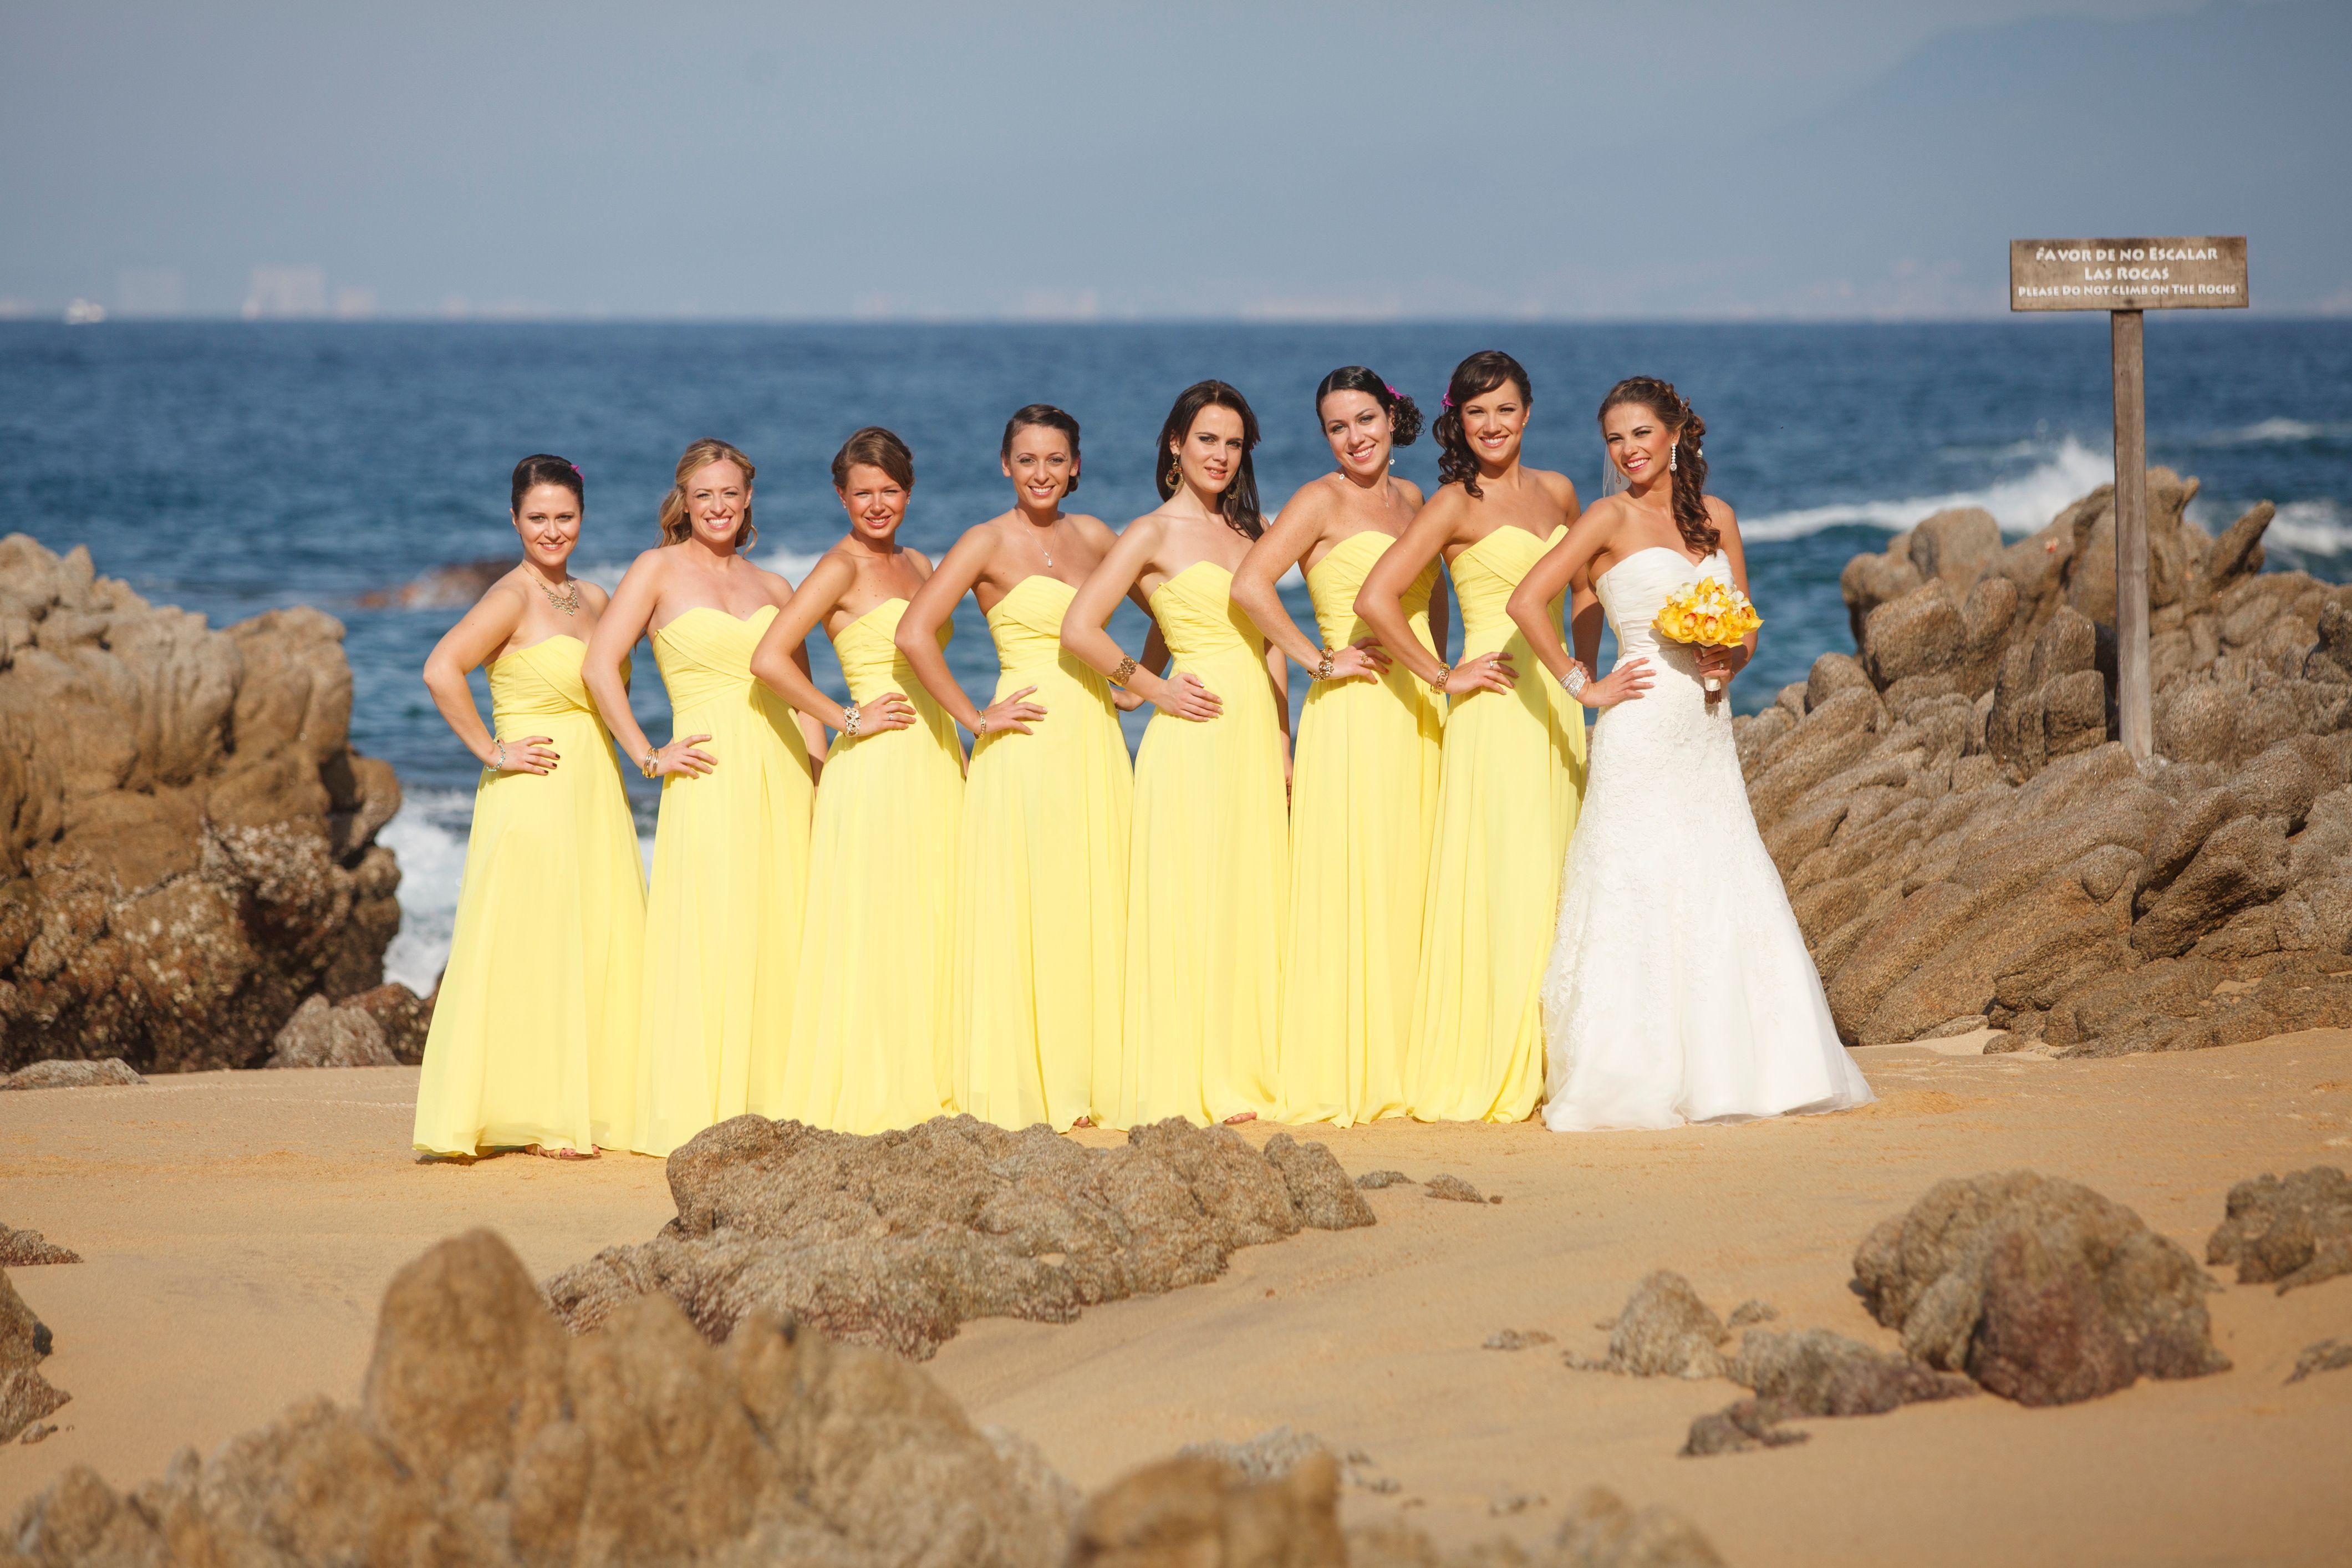 We Love The Yellow Dresses For A Beach Wedding Adventure Weddings At Las Caletas Dresspuerto Vallartabeach